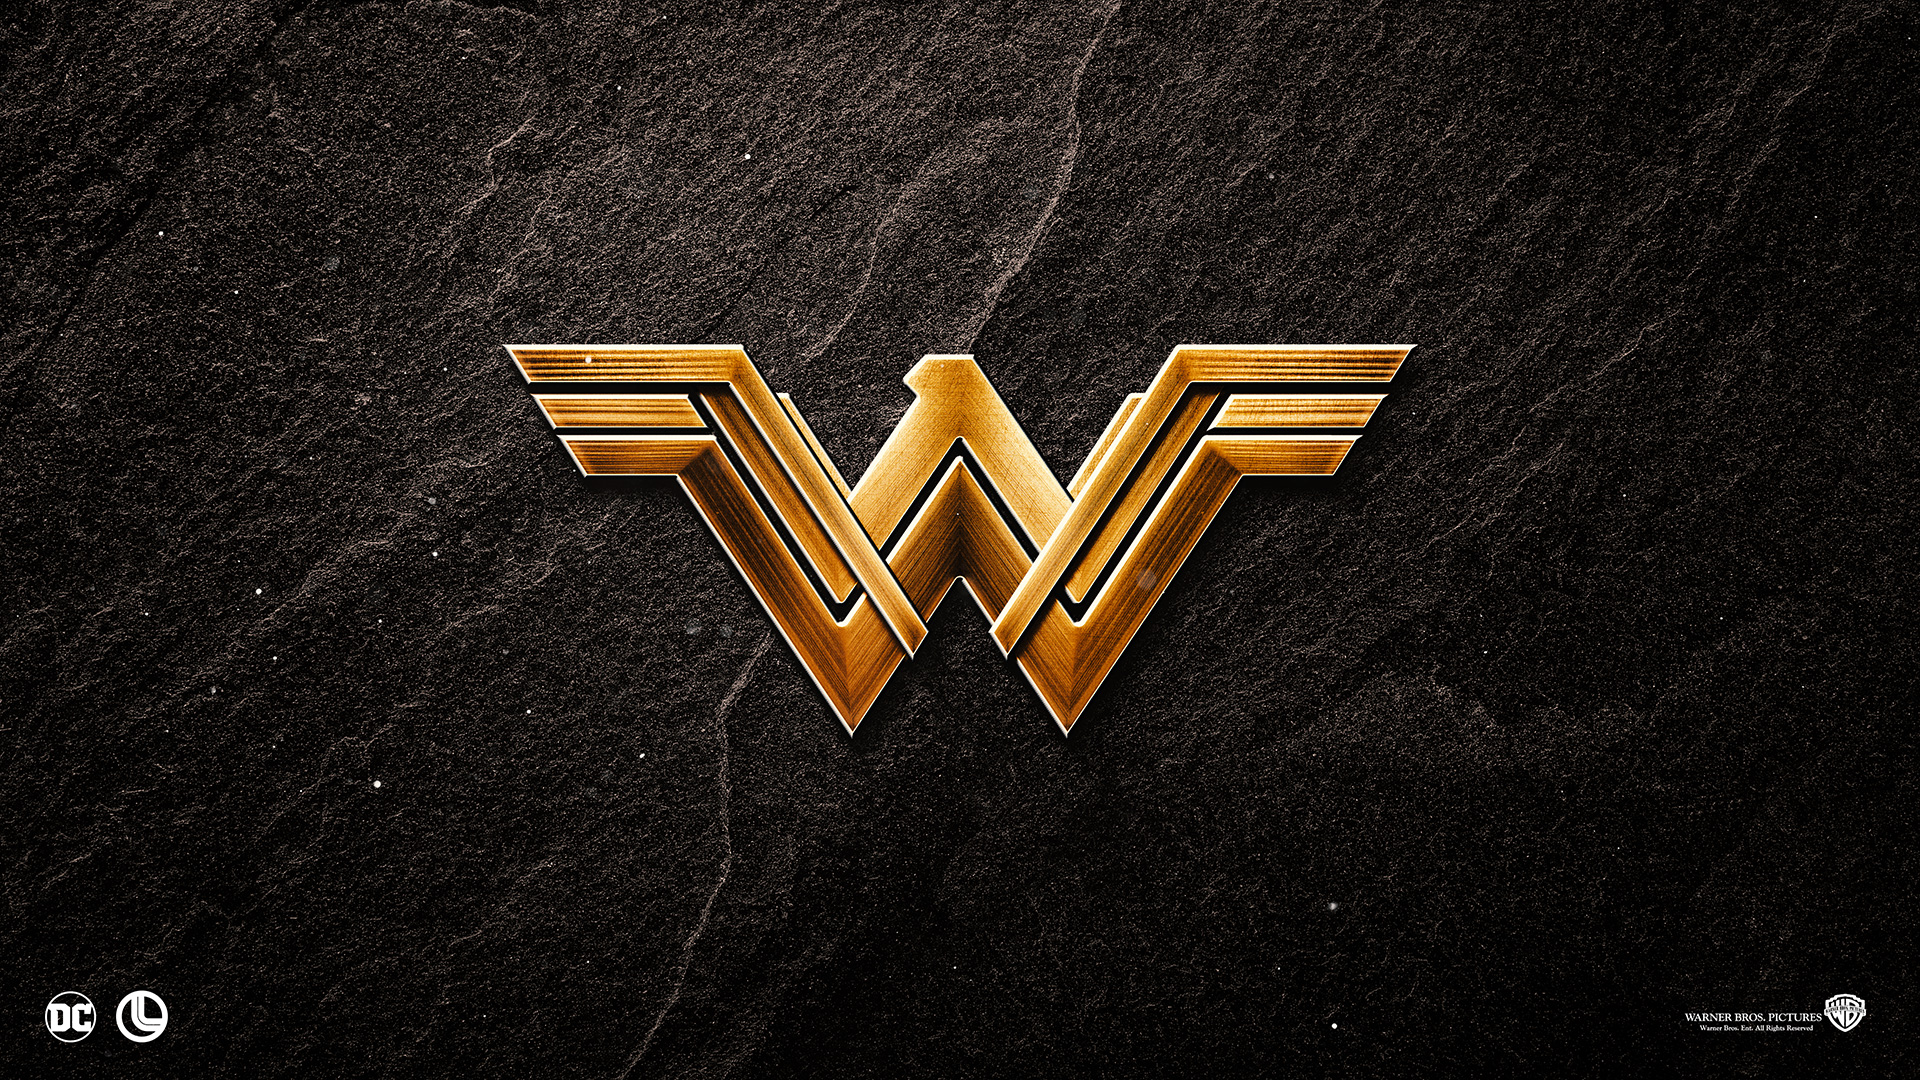 2017 Wonder Woman Wallpapers: Fondos Wonder Woman, Wallpapers La Mujer Maravilla 2017